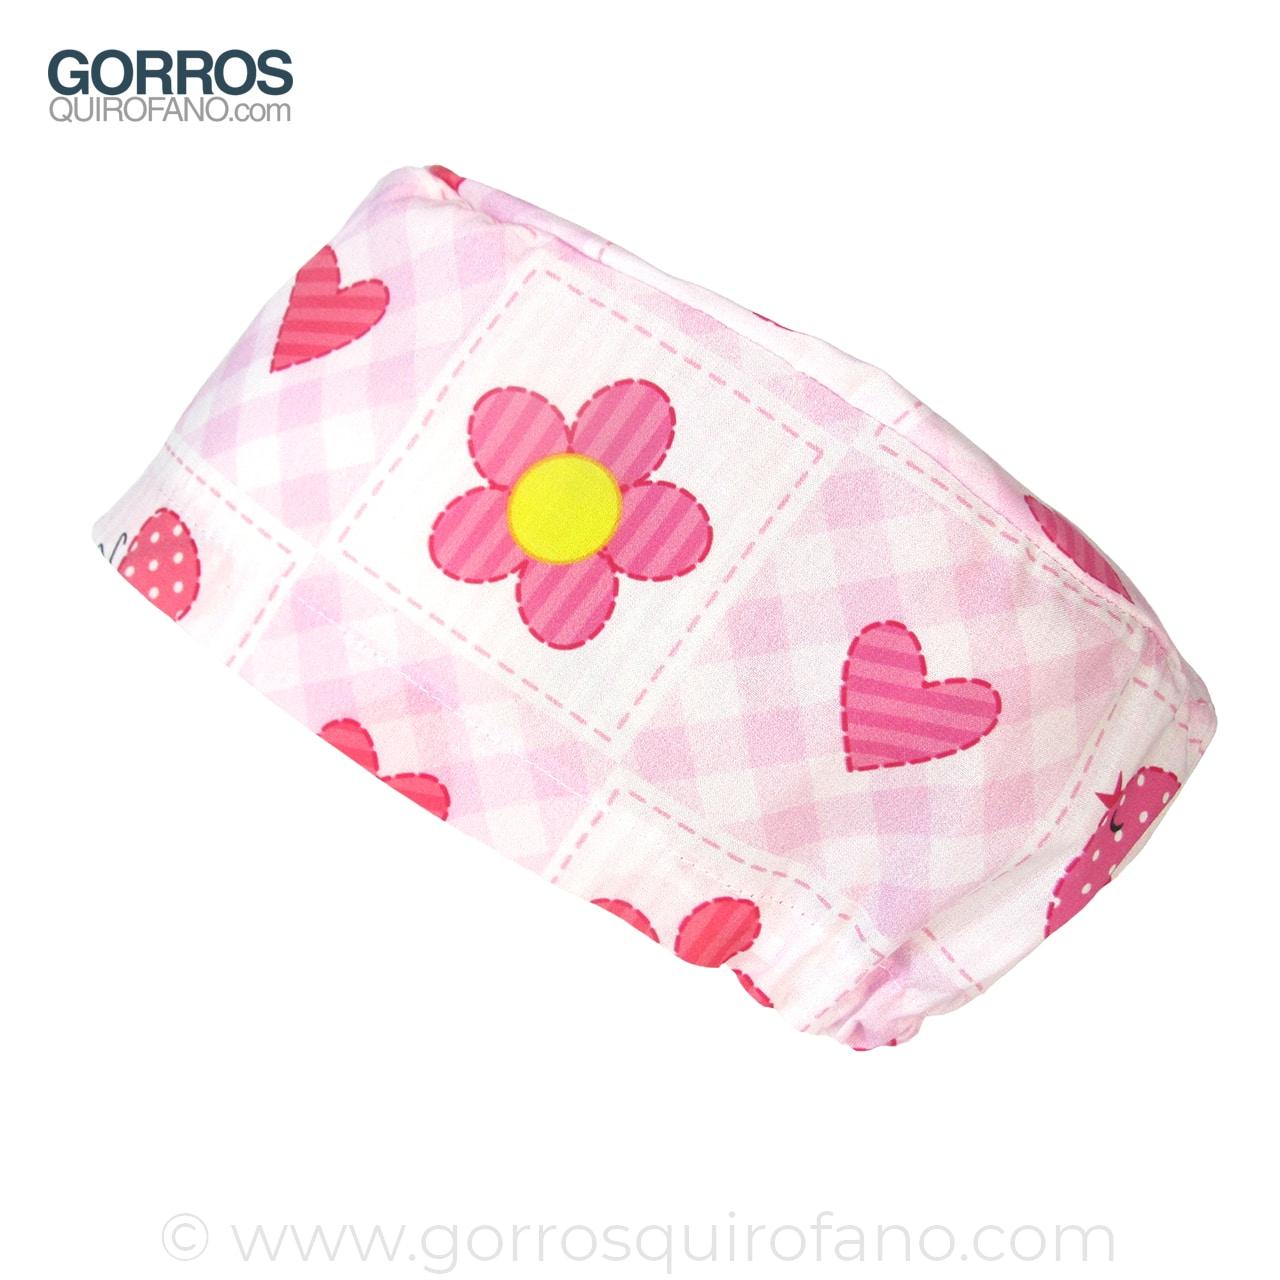 Gorros Quirofano Infantiles Flores Corazones